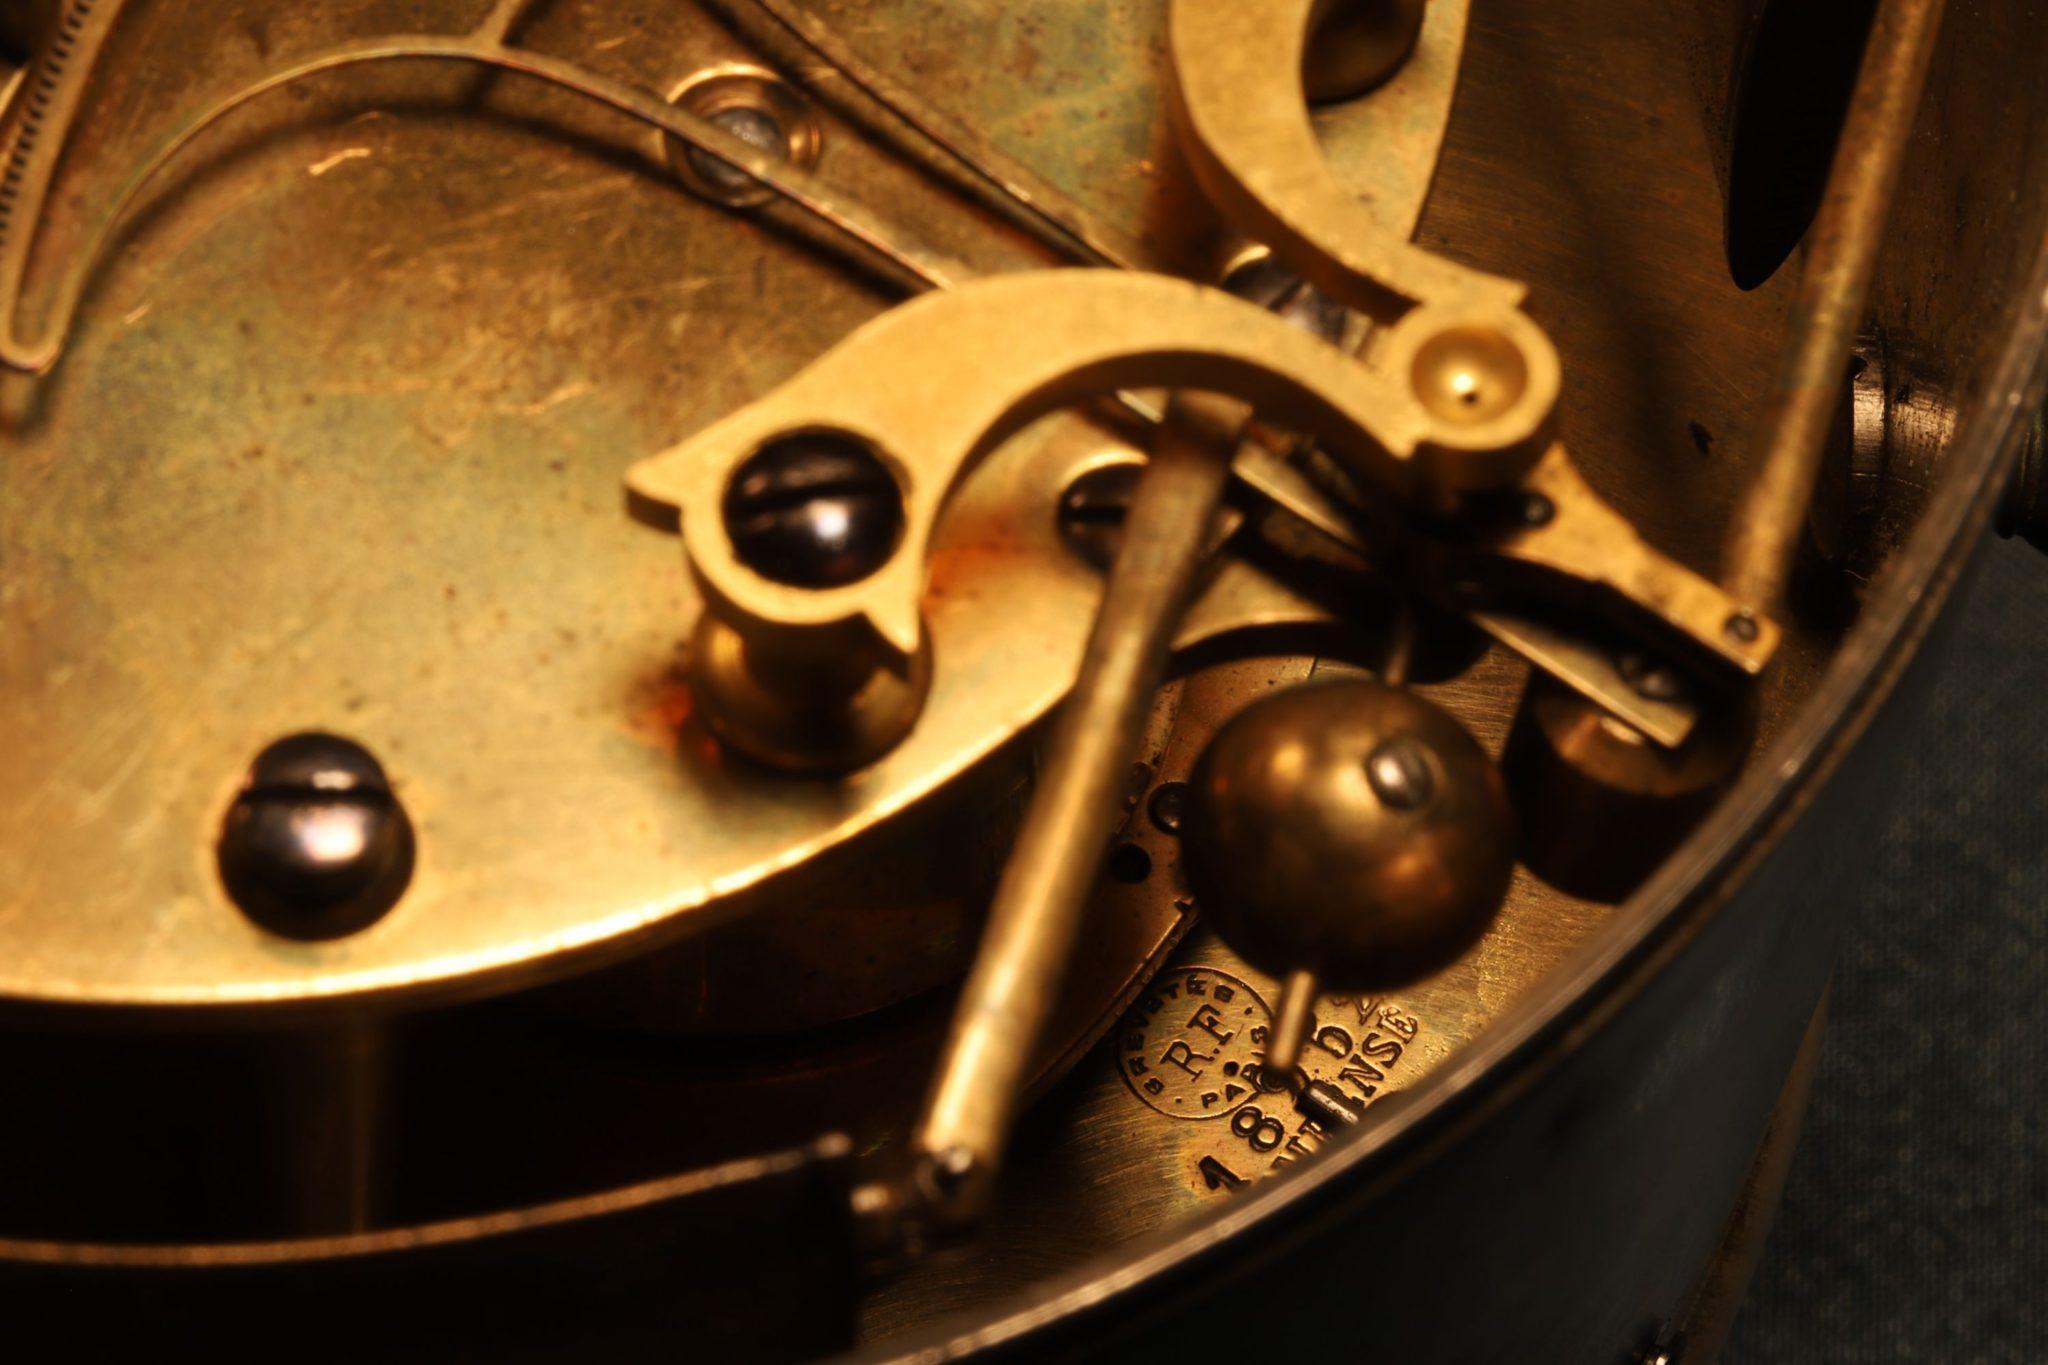 Image of Bourdon & Richard Clock Barometer No 539